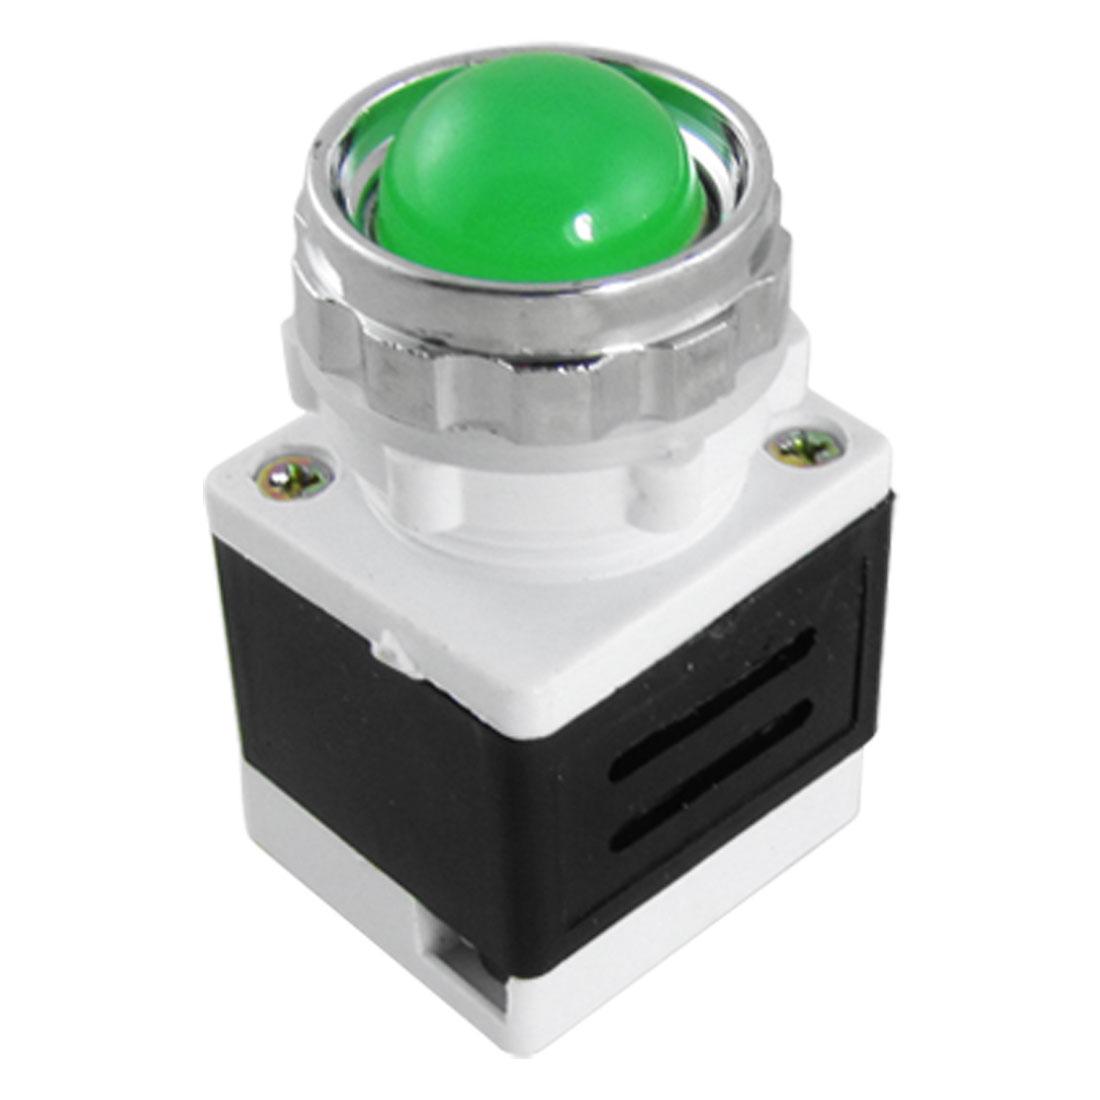 AD11-25/20 AC DC 24V LED Green Ball Signal Indicator Light Lamp